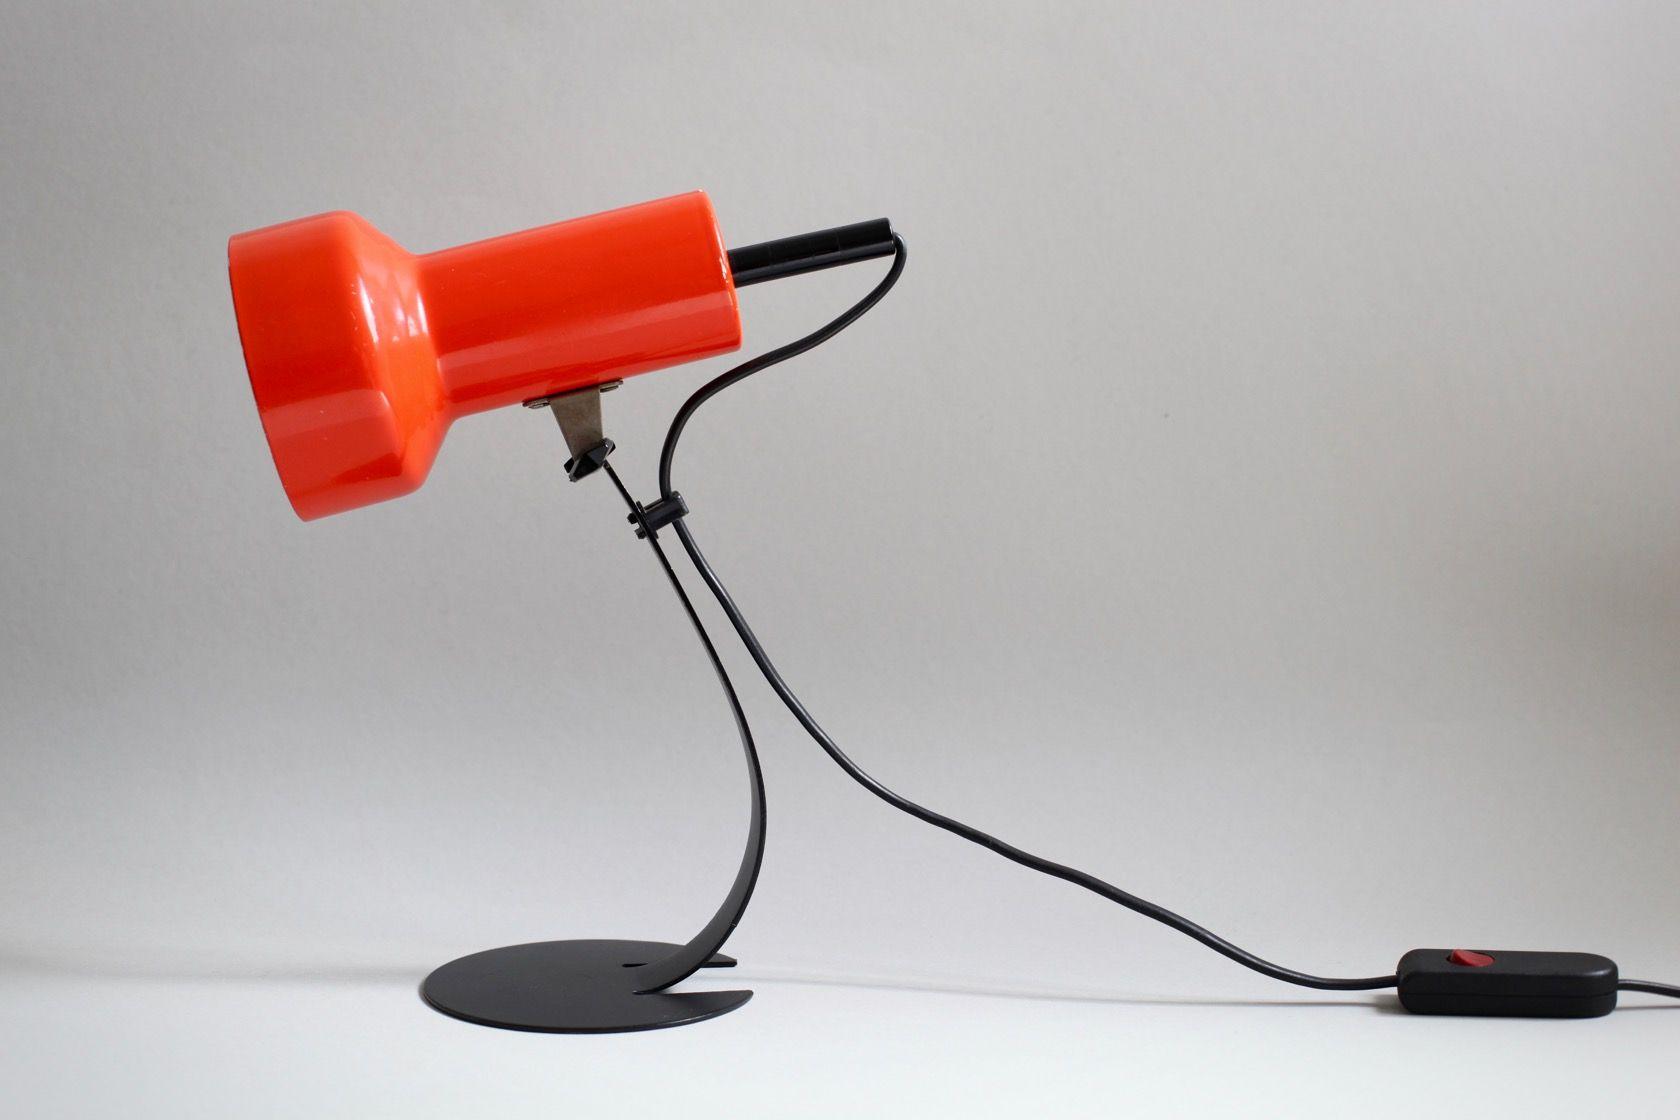 petite lampe de bureau 1970s en vente sur pamono. Black Bedroom Furniture Sets. Home Design Ideas